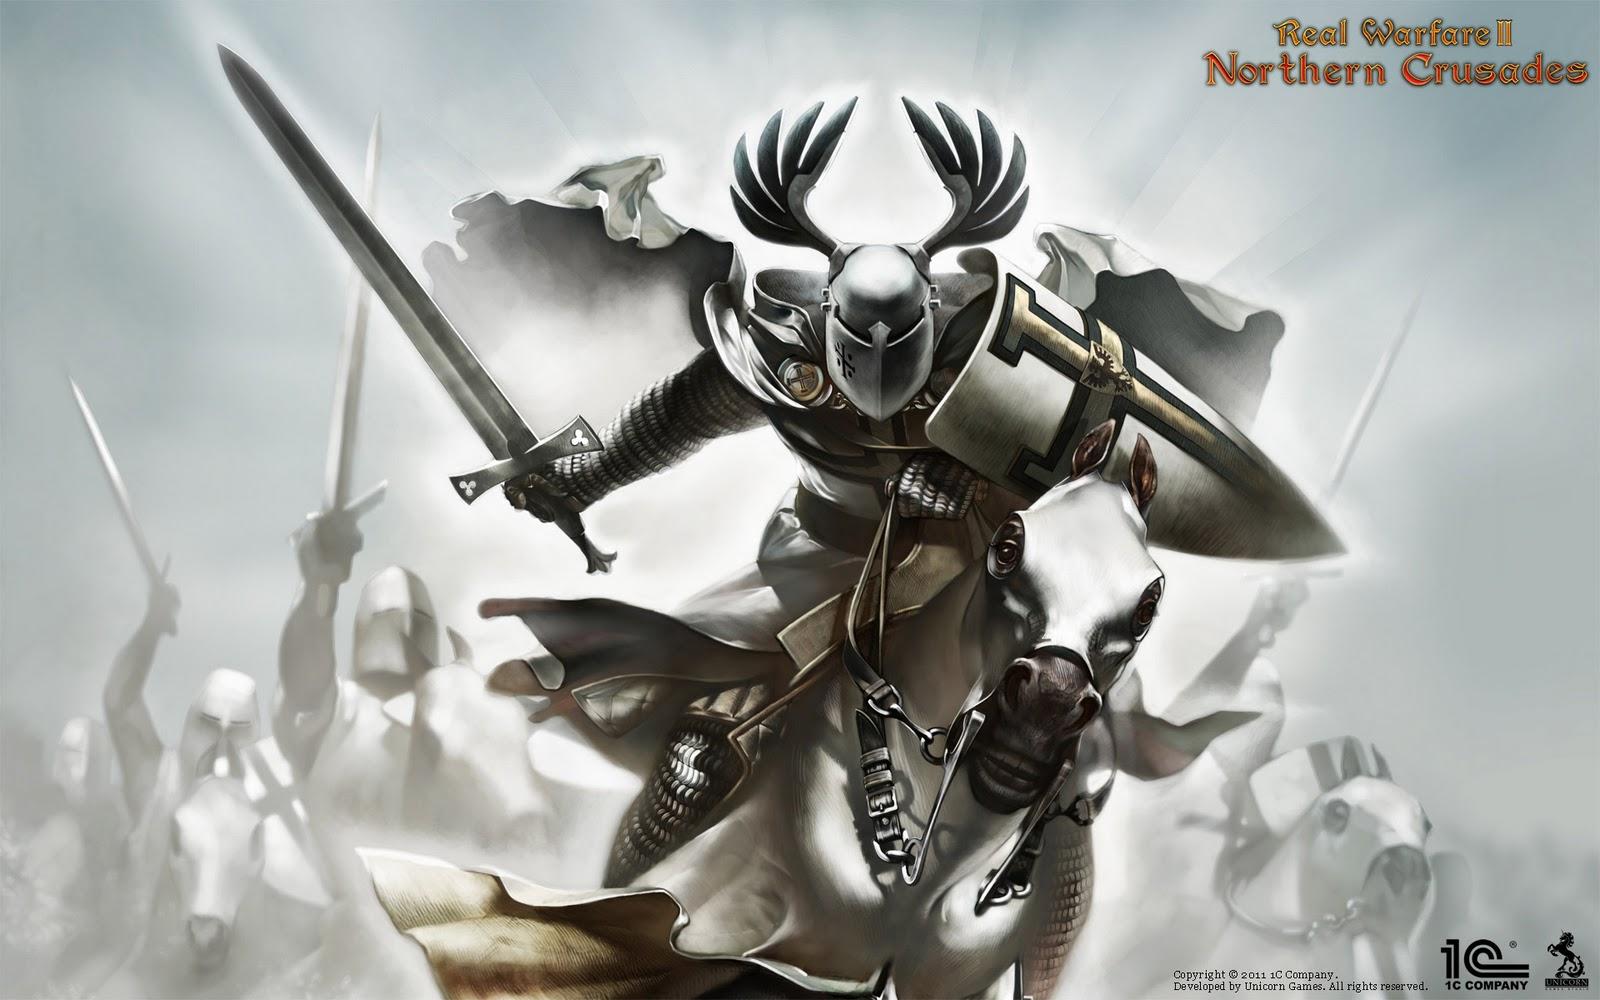 Eu também! Real+Warfare+2+Northern+Crusades